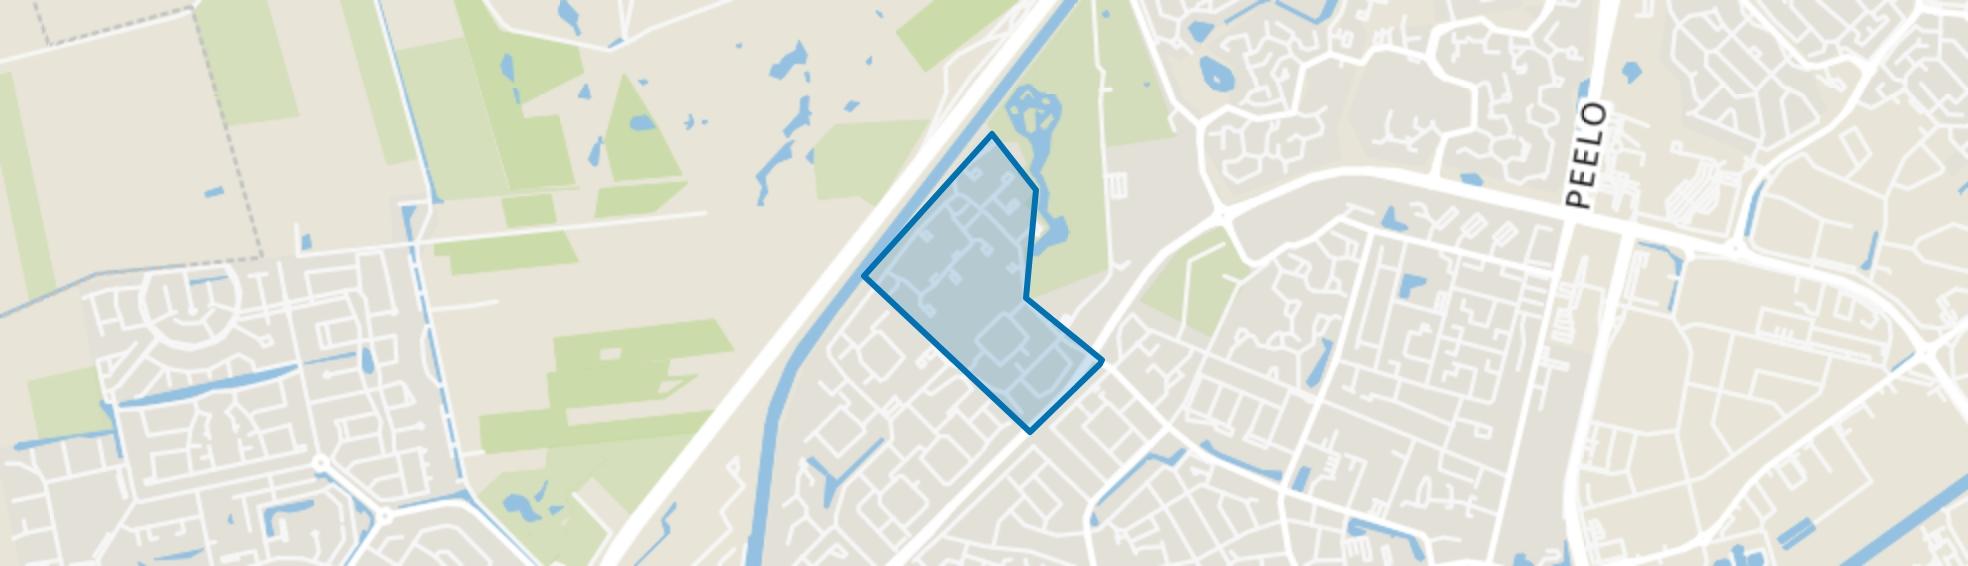 Pittelo Noord, Assen map